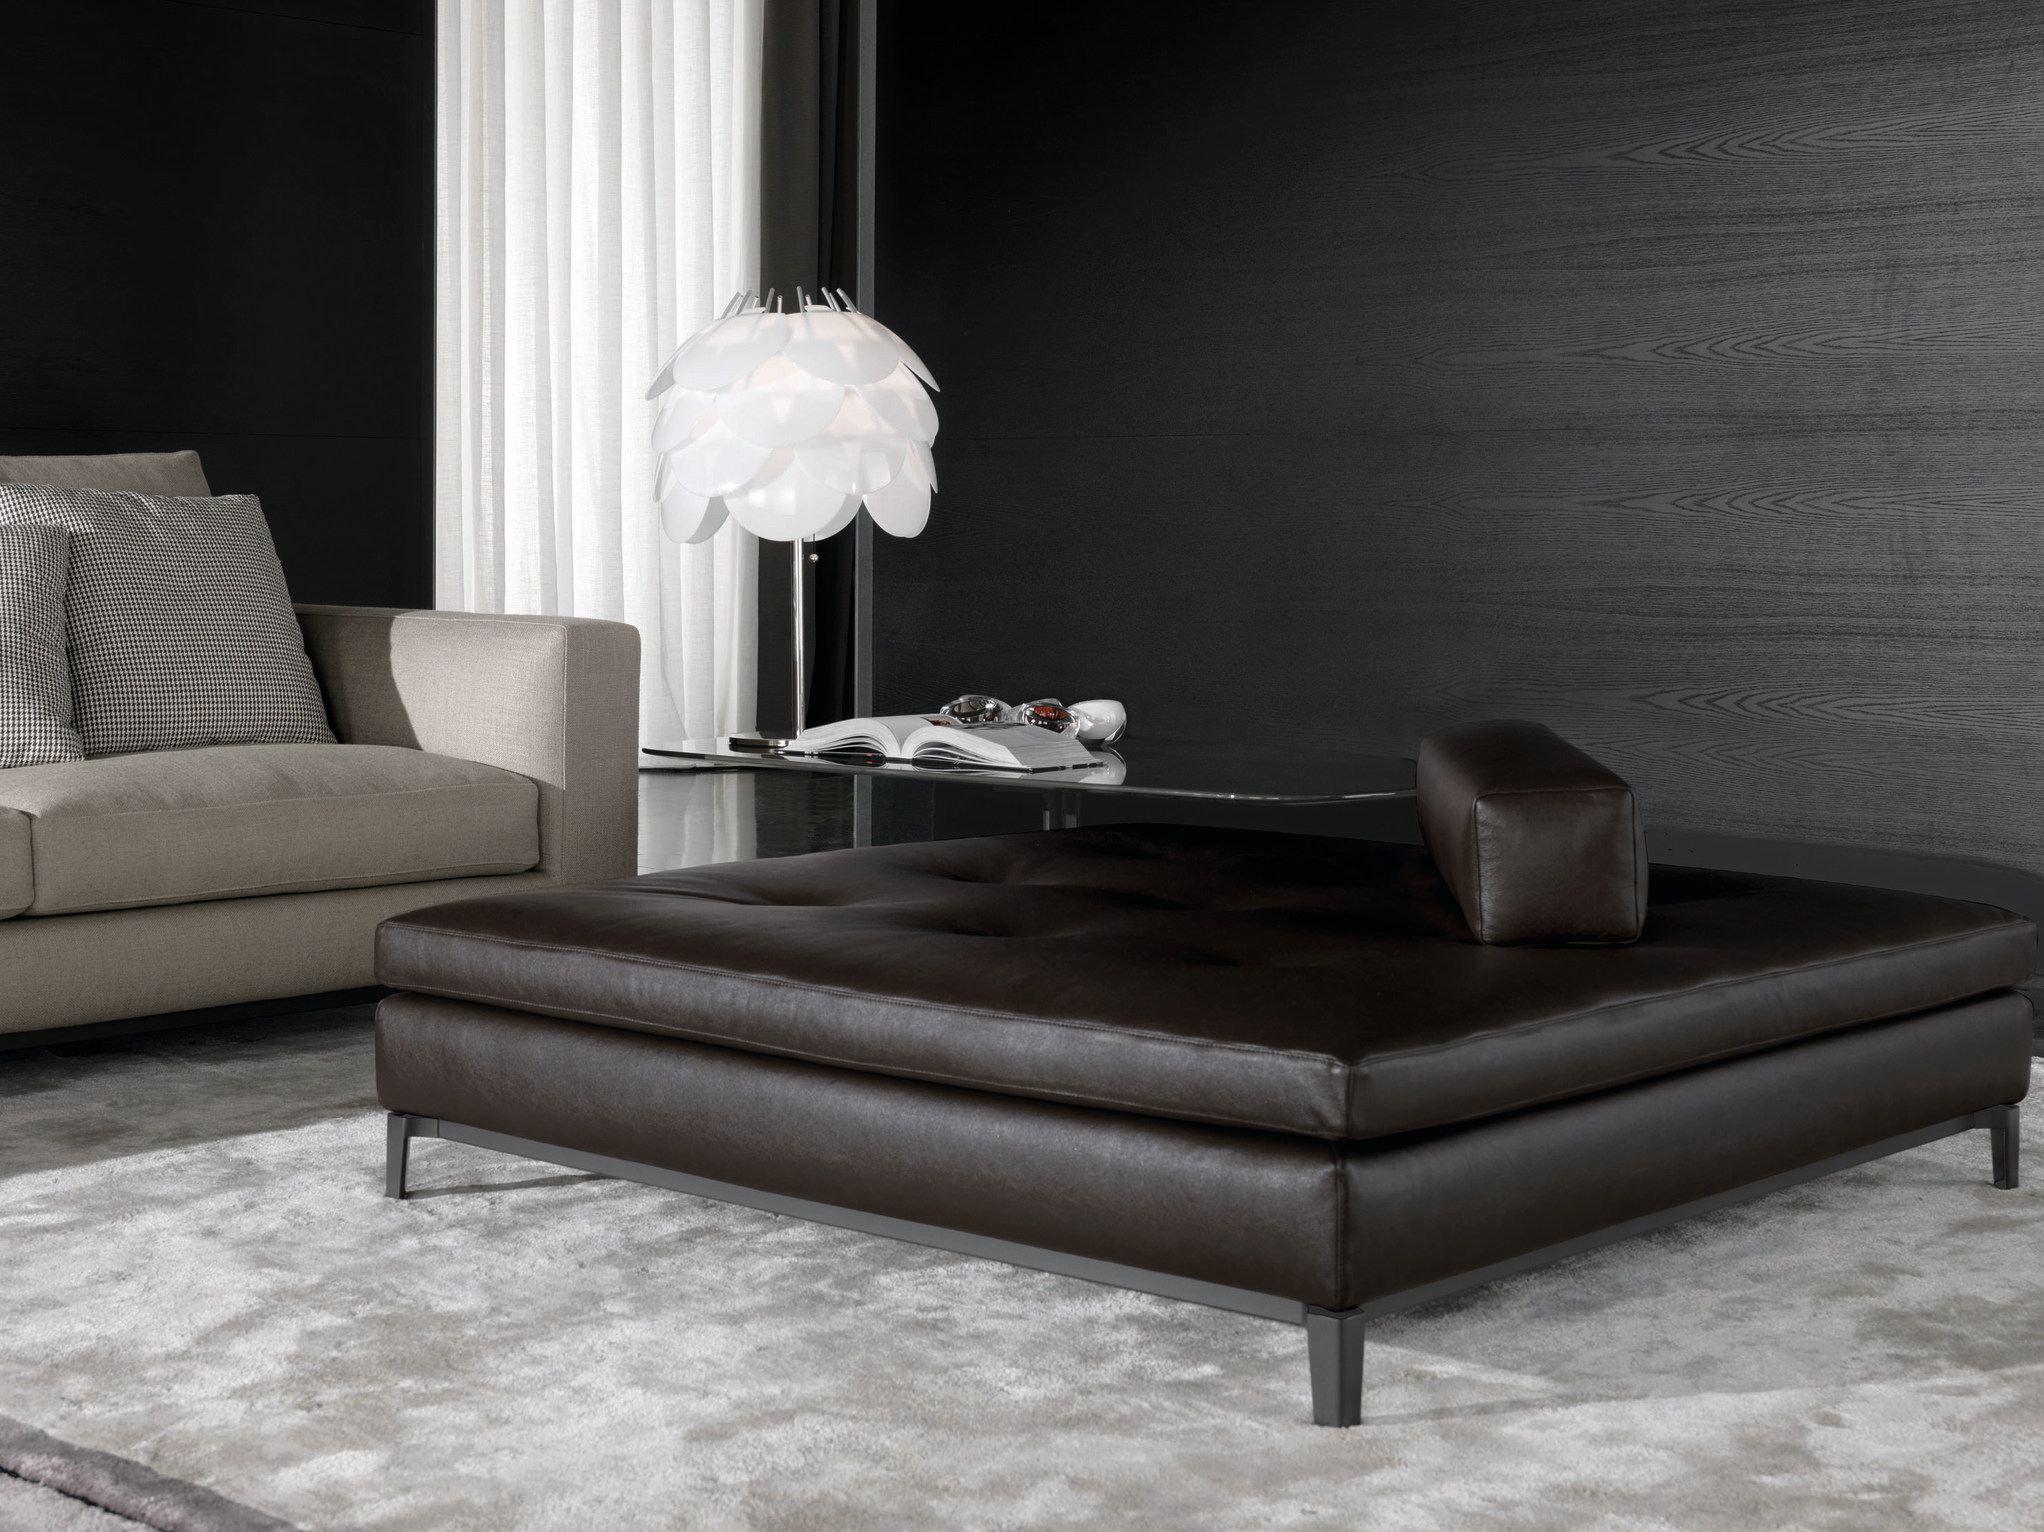 3 er gepolstertes sofa aus stoff andersen serie andersen. Black Bedroom Furniture Sets. Home Design Ideas